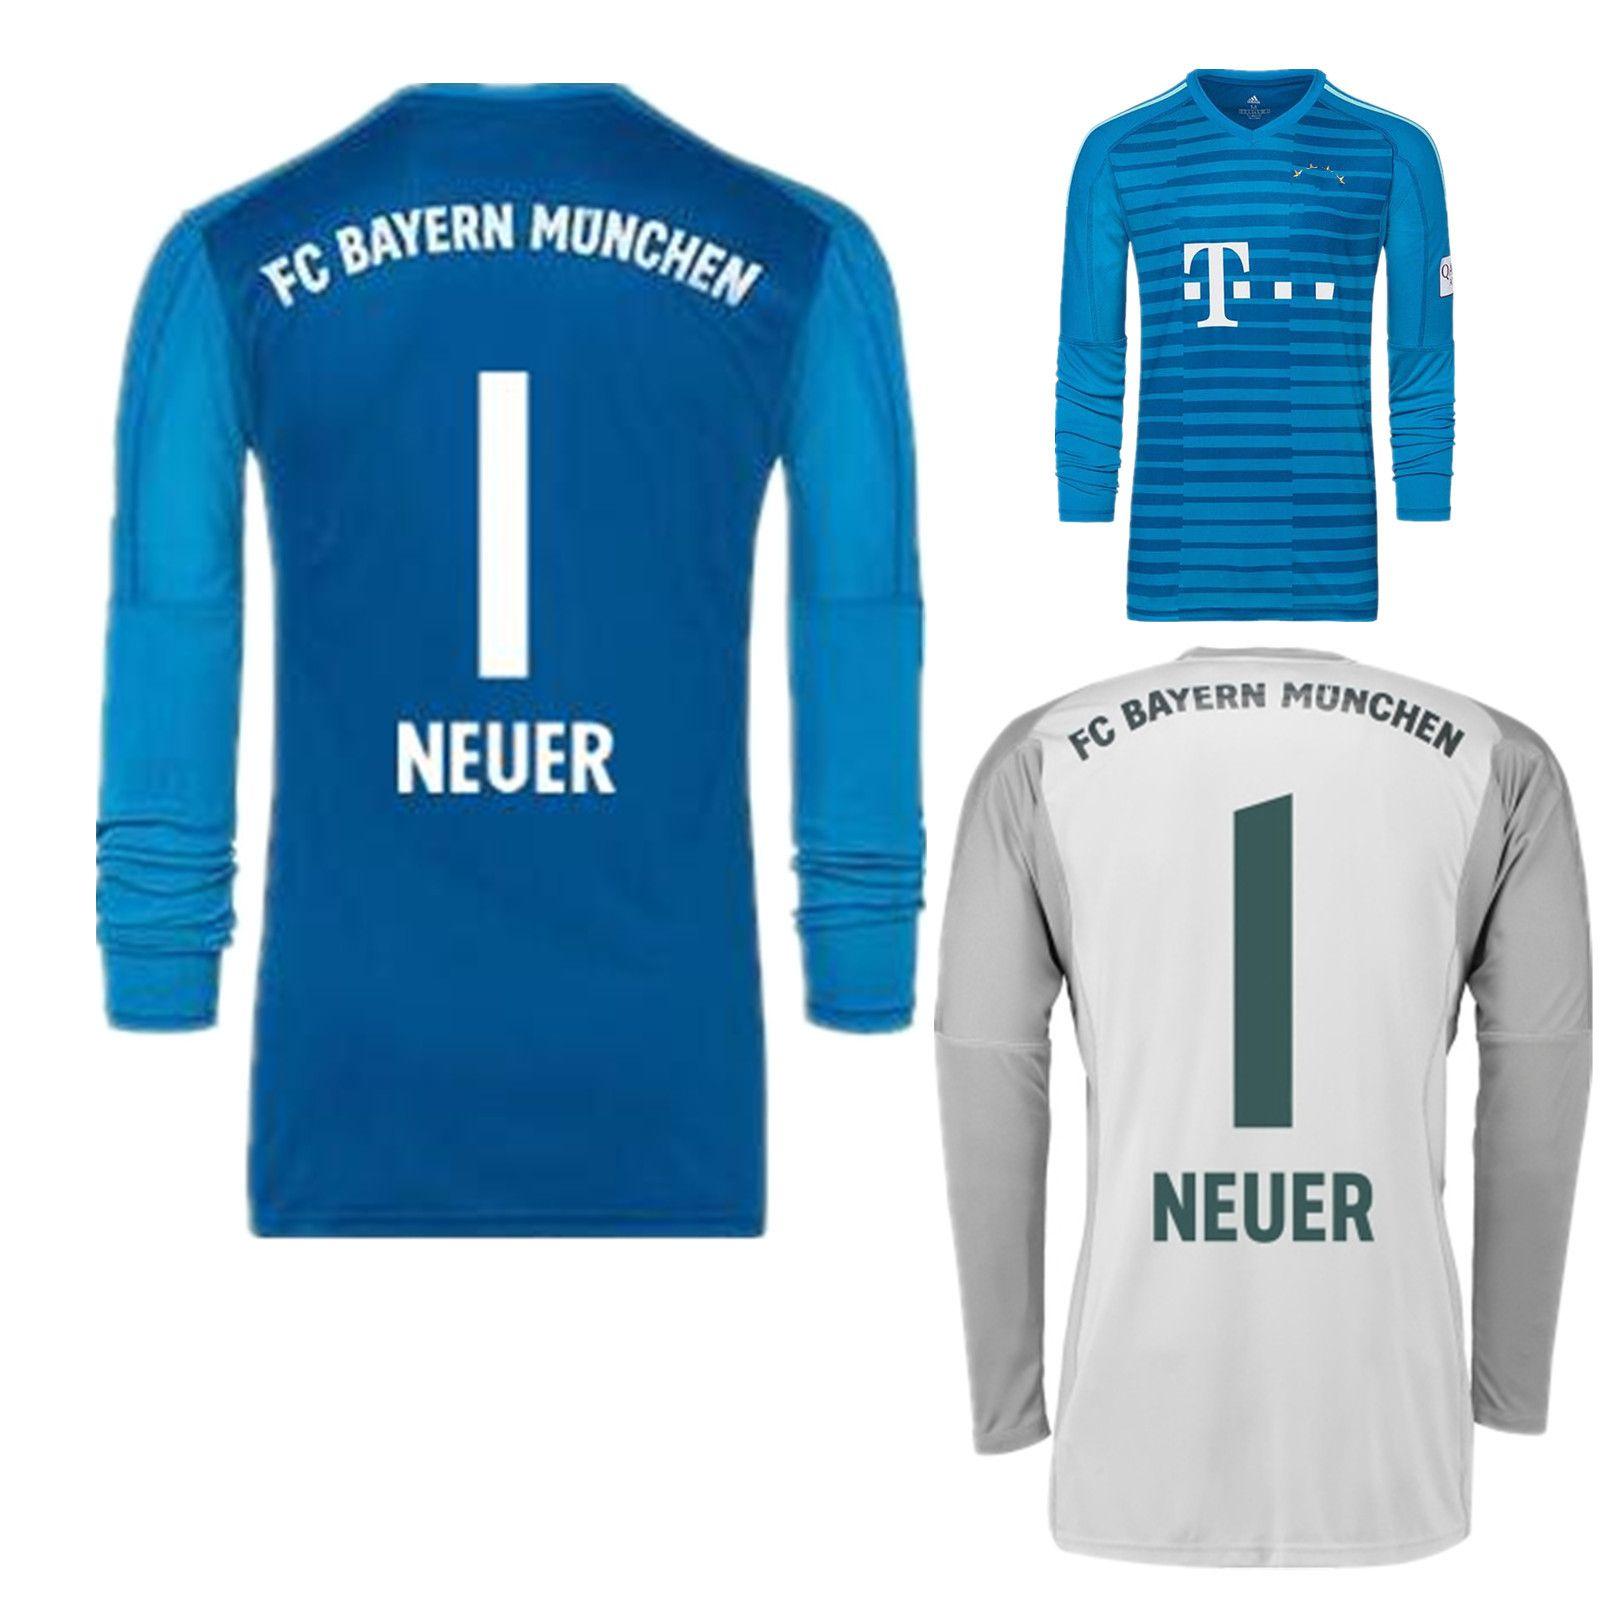 2018 2019 Camiseta De Manga Larga Azul Marino NEUER Portero Jerseys De  Fútbol   1 Manuel Neuer 26 Ulreich Portero GK Kit 18 19 Gris Camisetas De  Fútbol Por ... 21d984a4d33c9